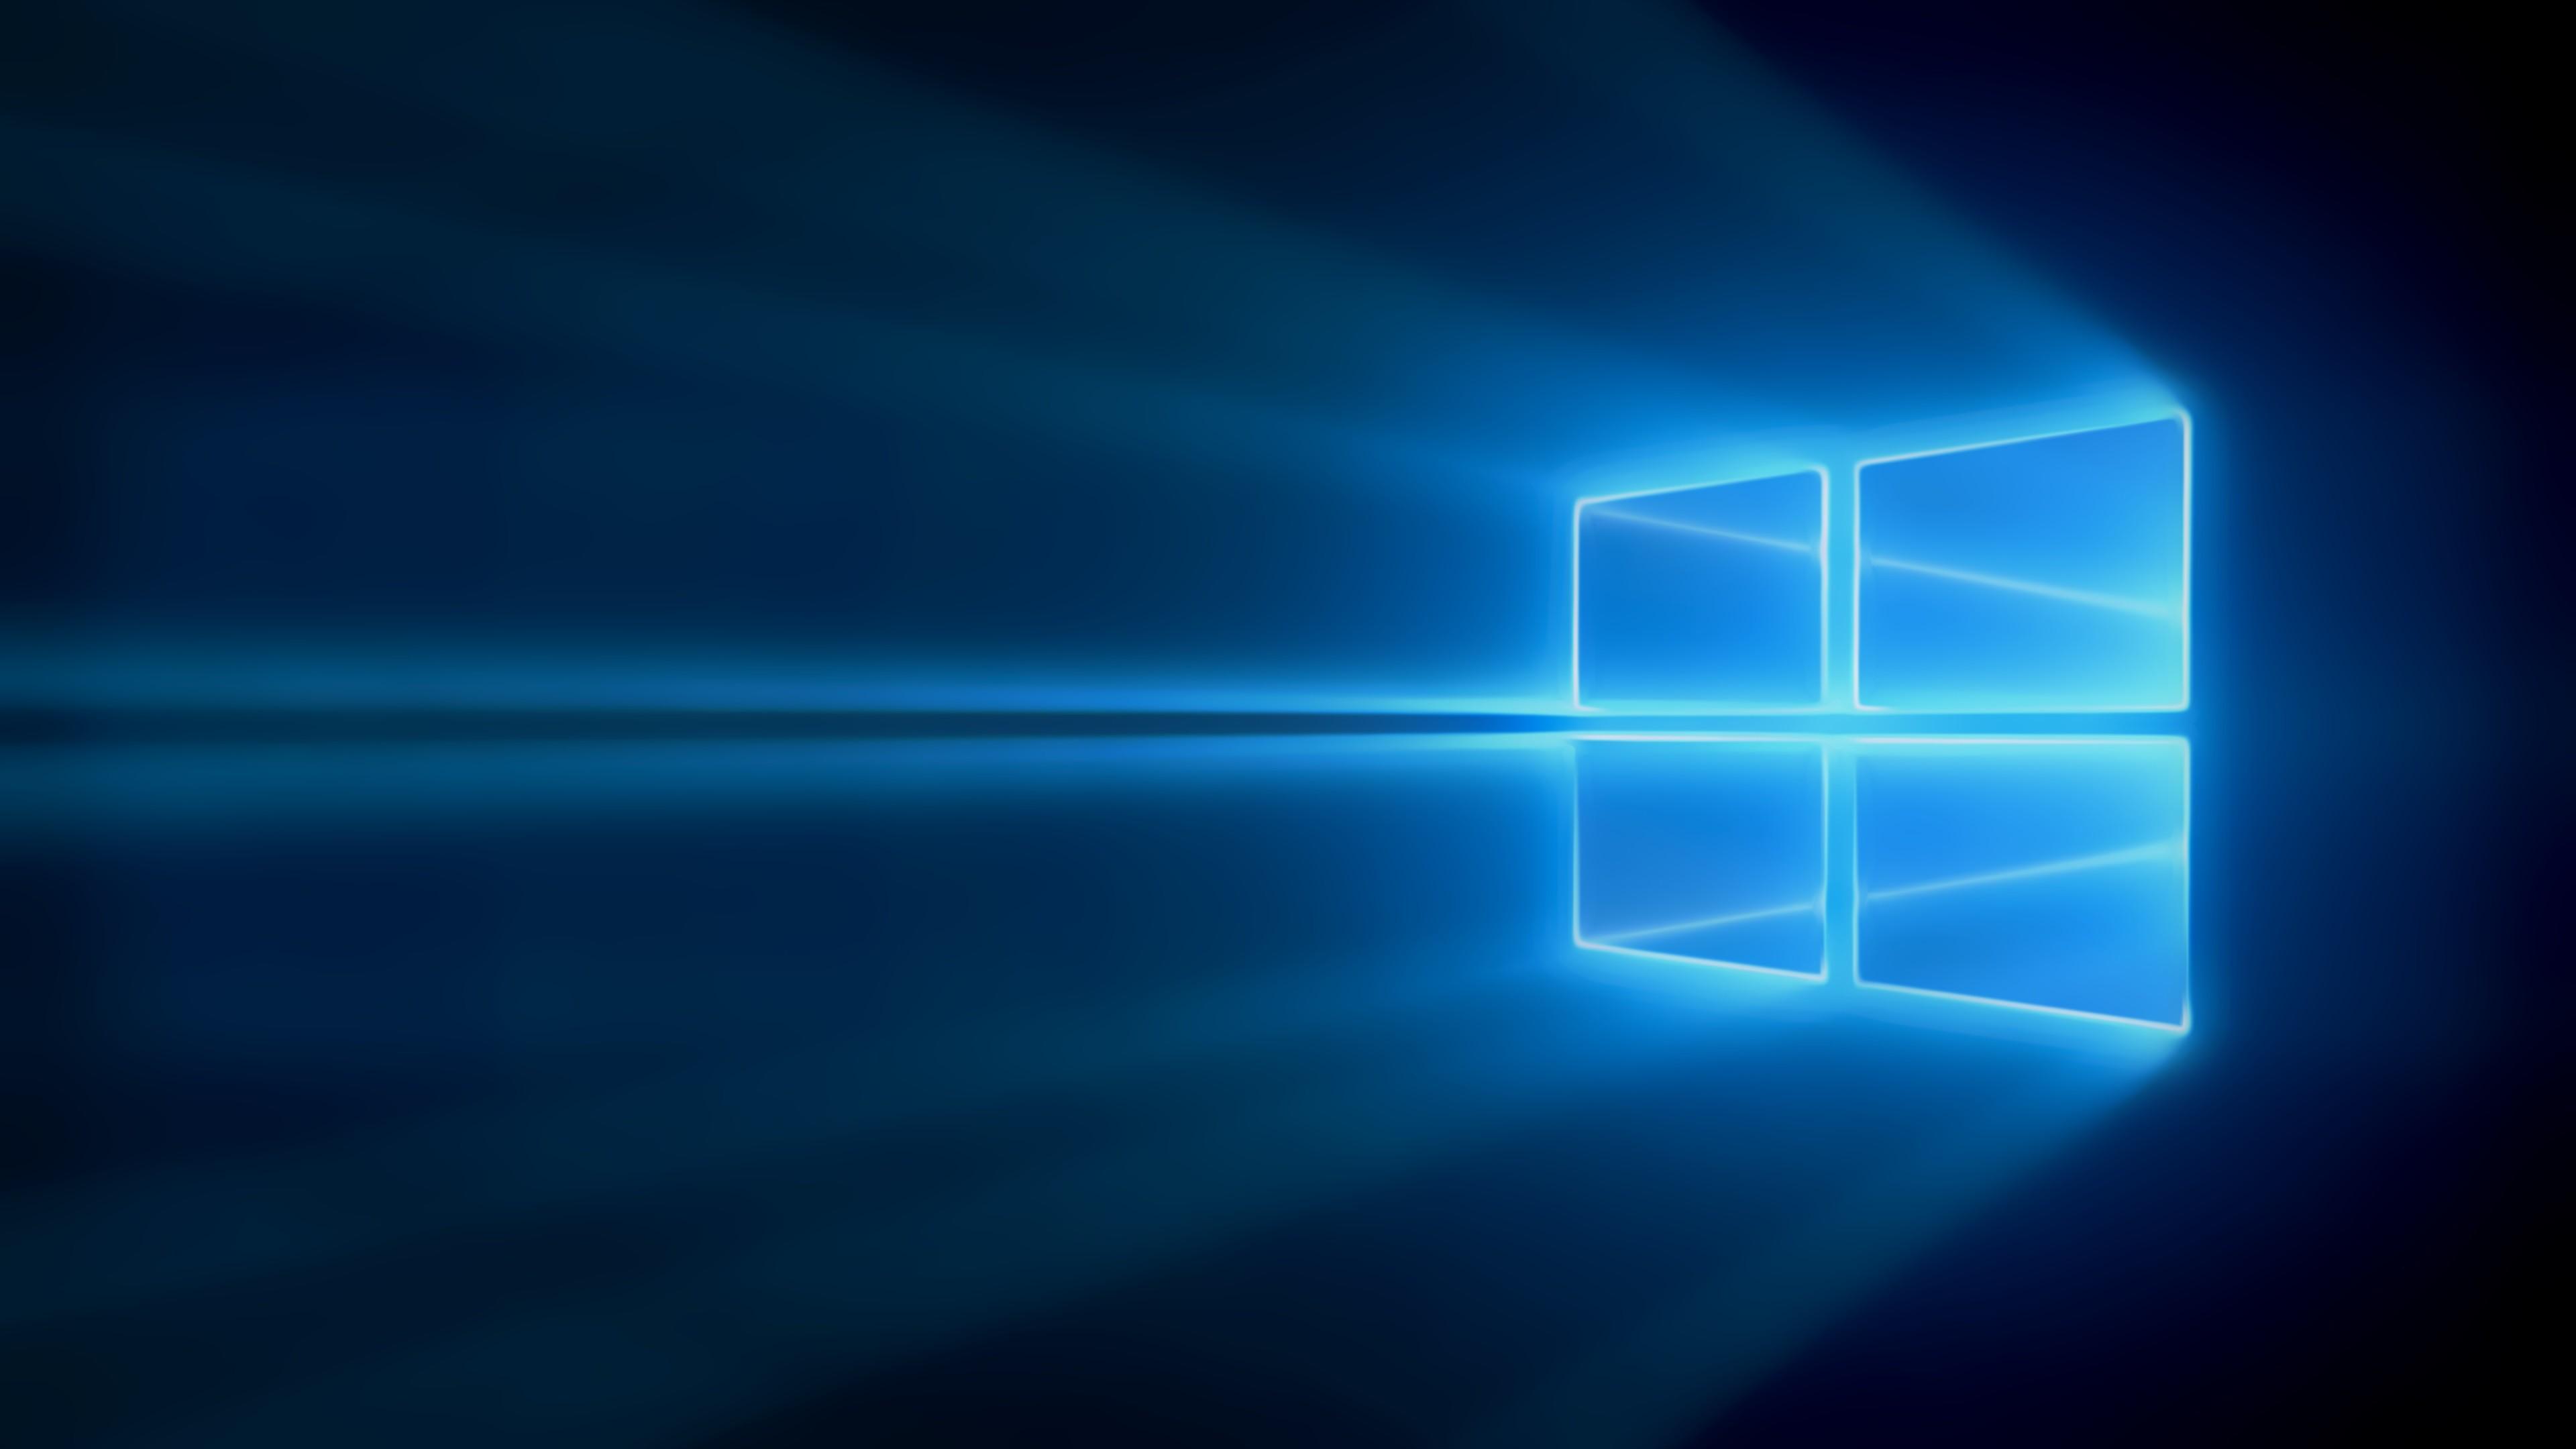 Windows 10 HD Wallpapers 3840x2160